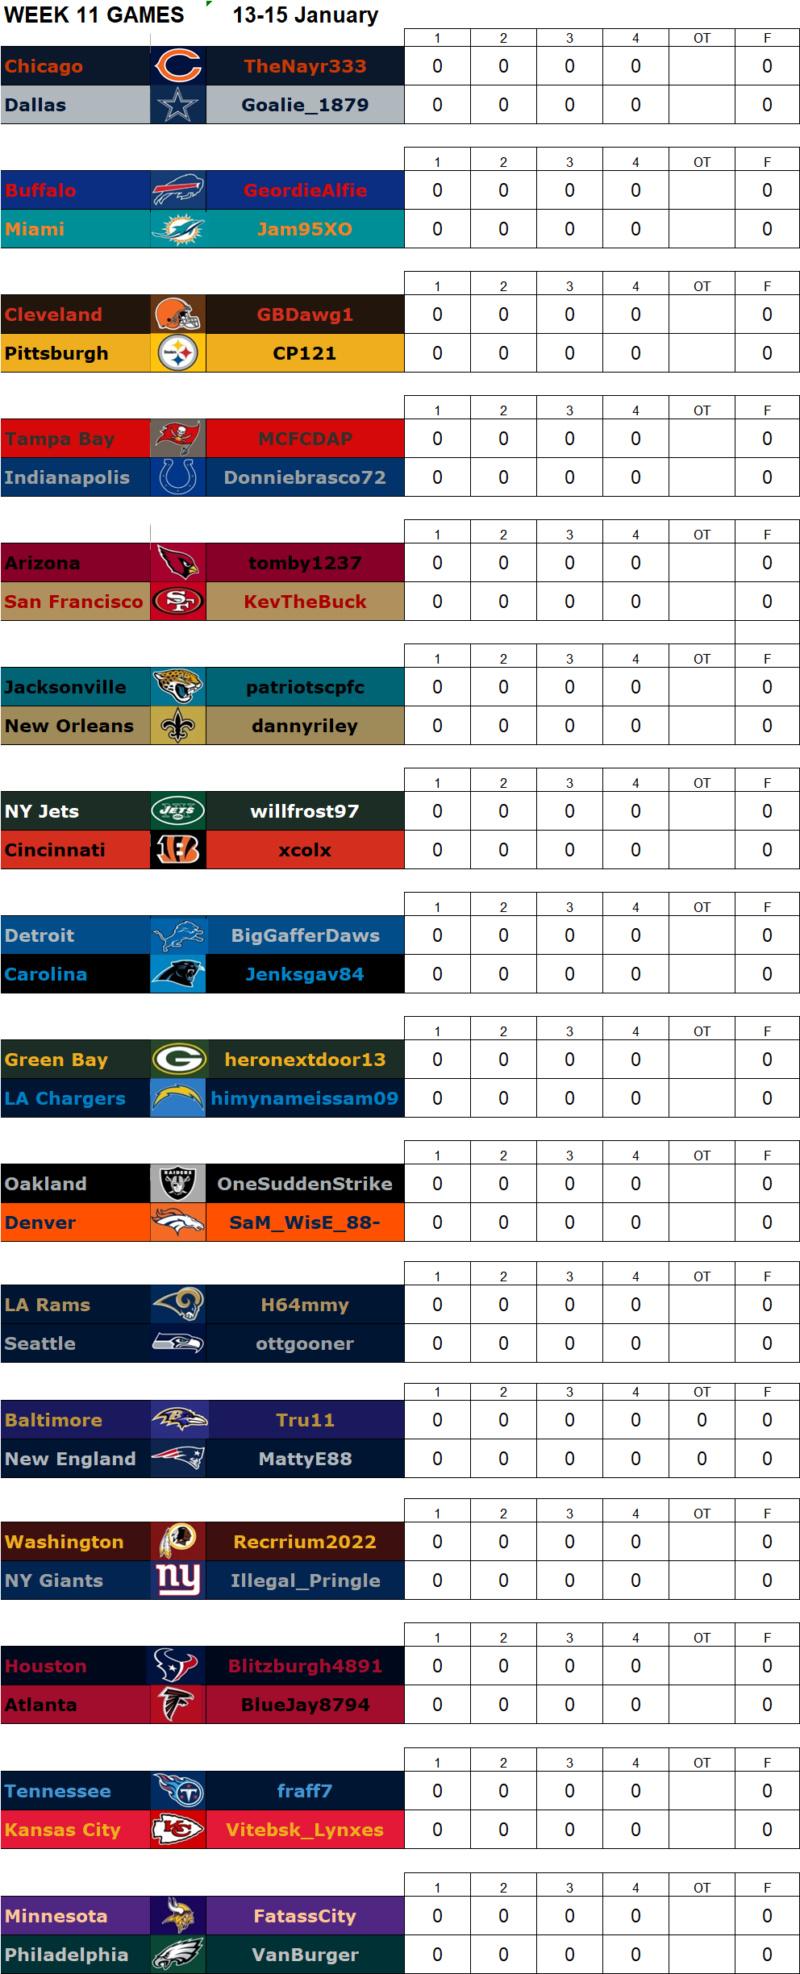 Week 11 Matchups, 13-15 January **Amended** W11g13